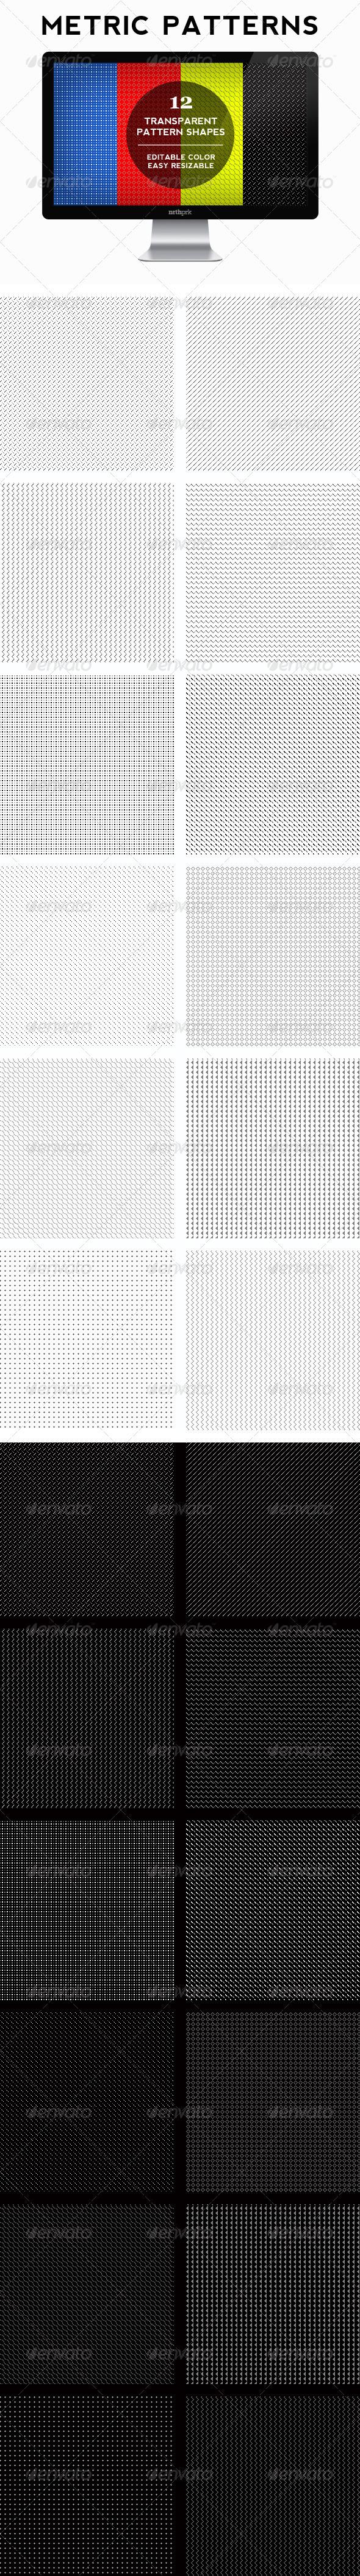 Metric Patterns Set - Miscellaneous Textures / Fills / Patterns